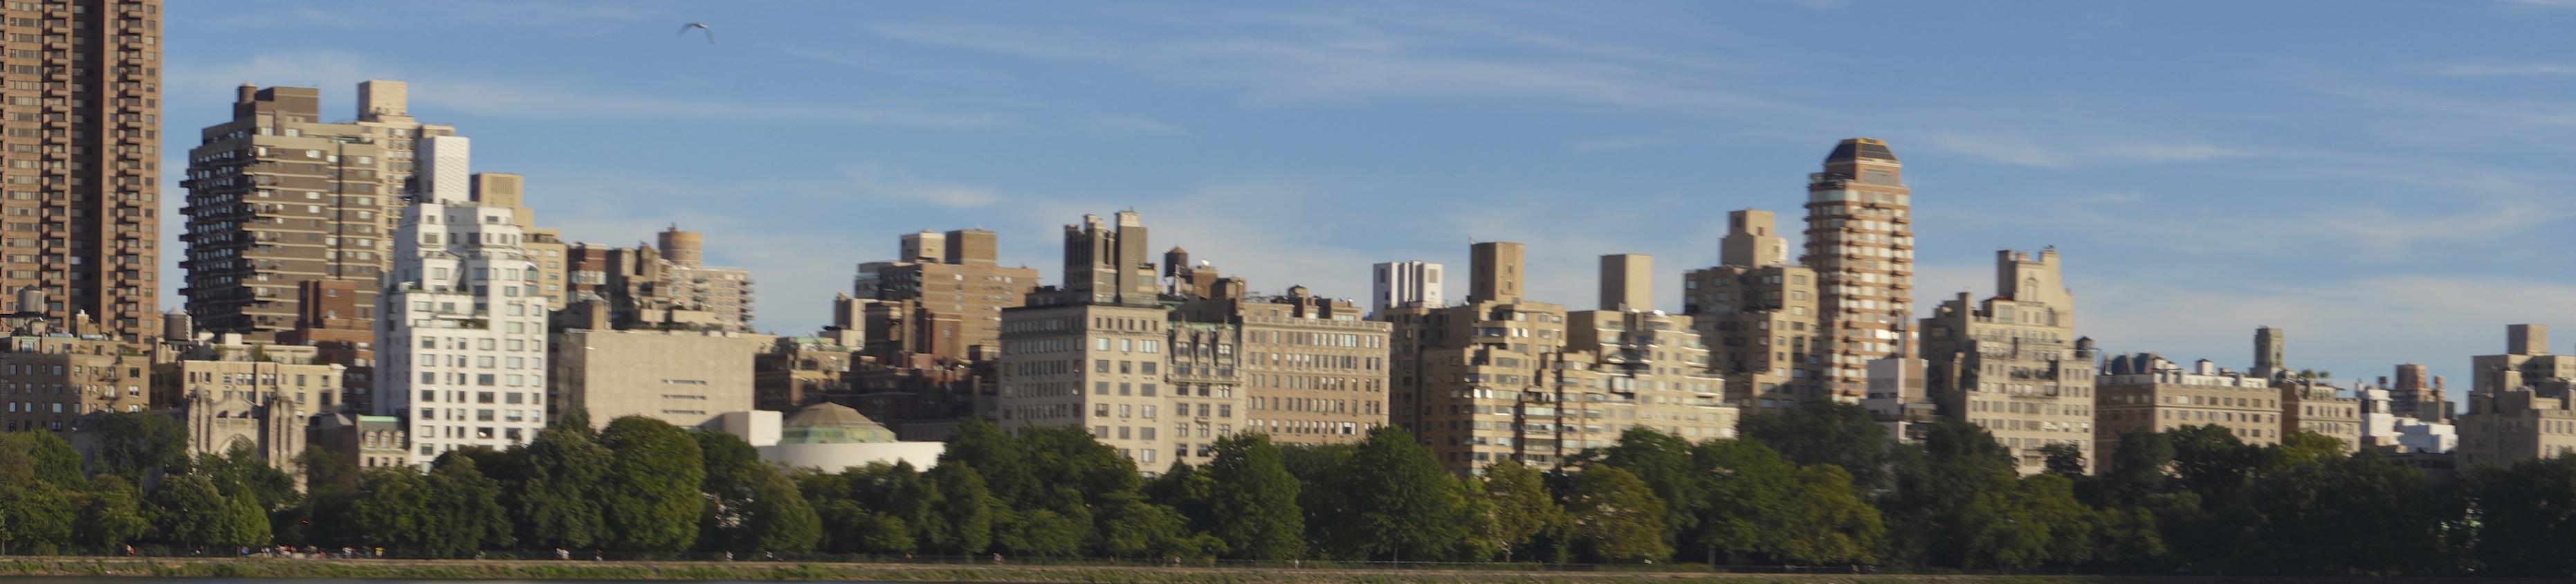 9-2013 New York 22204 - Version 2